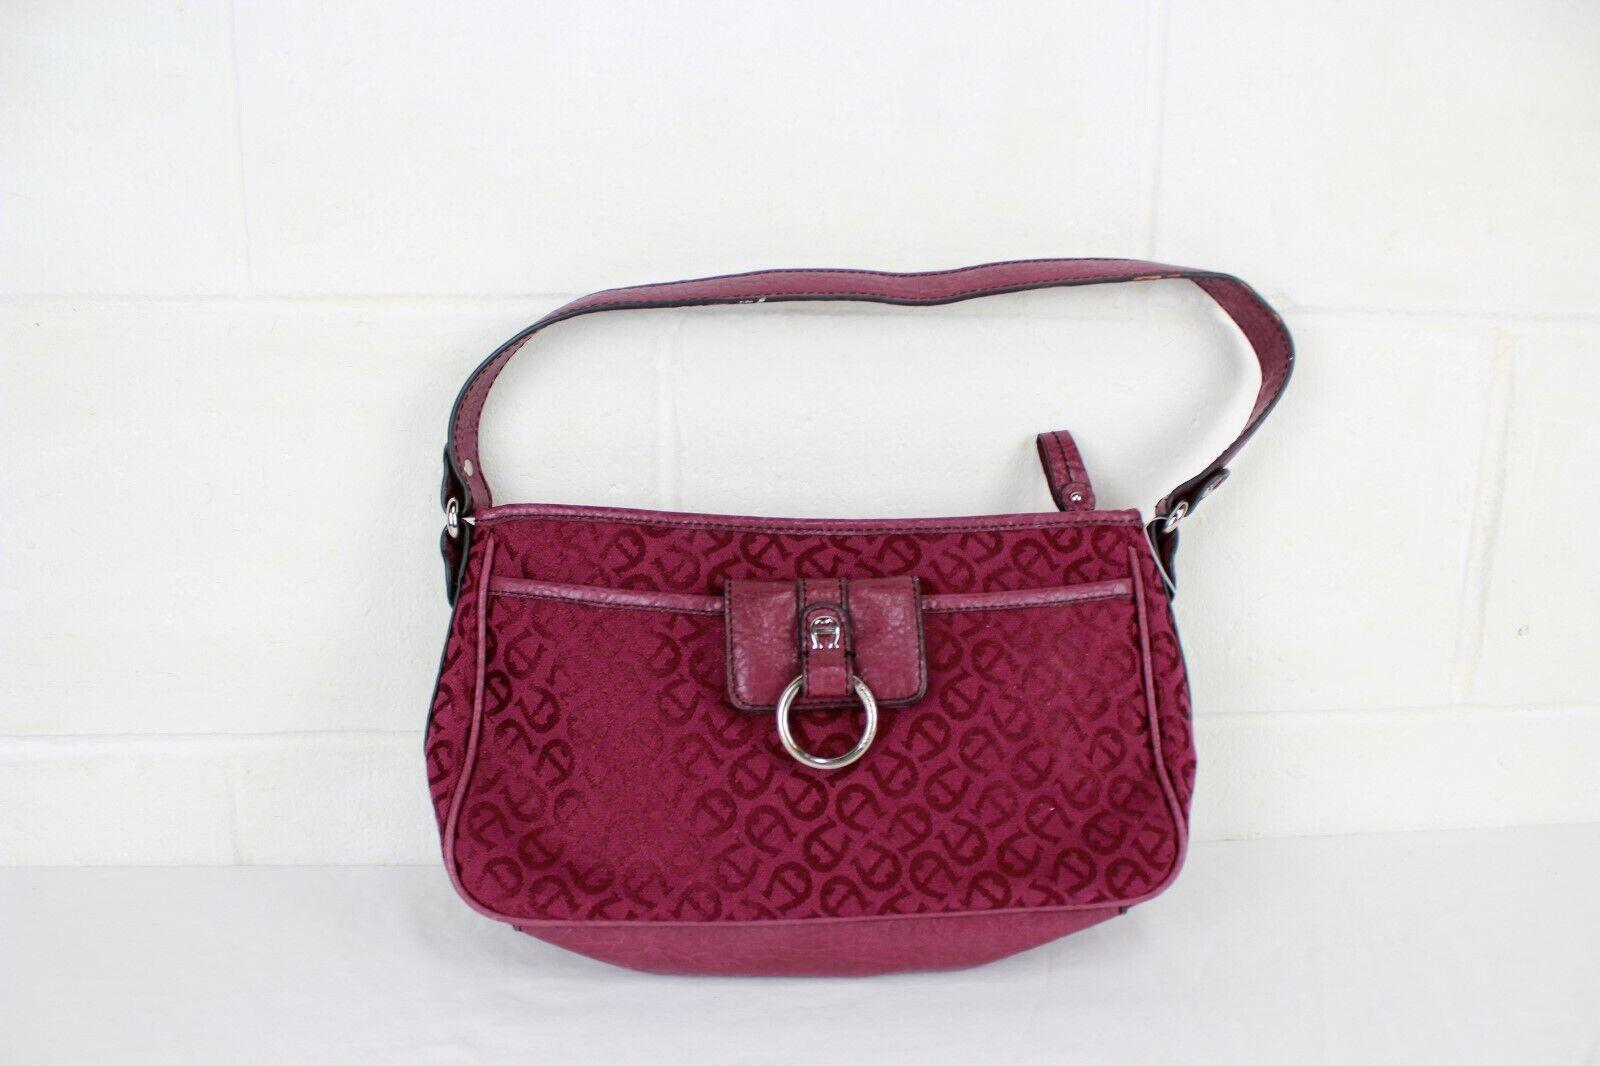 Vintage ETIENNE AIGNER Burgundy singnature logo satchel Handbag Purse